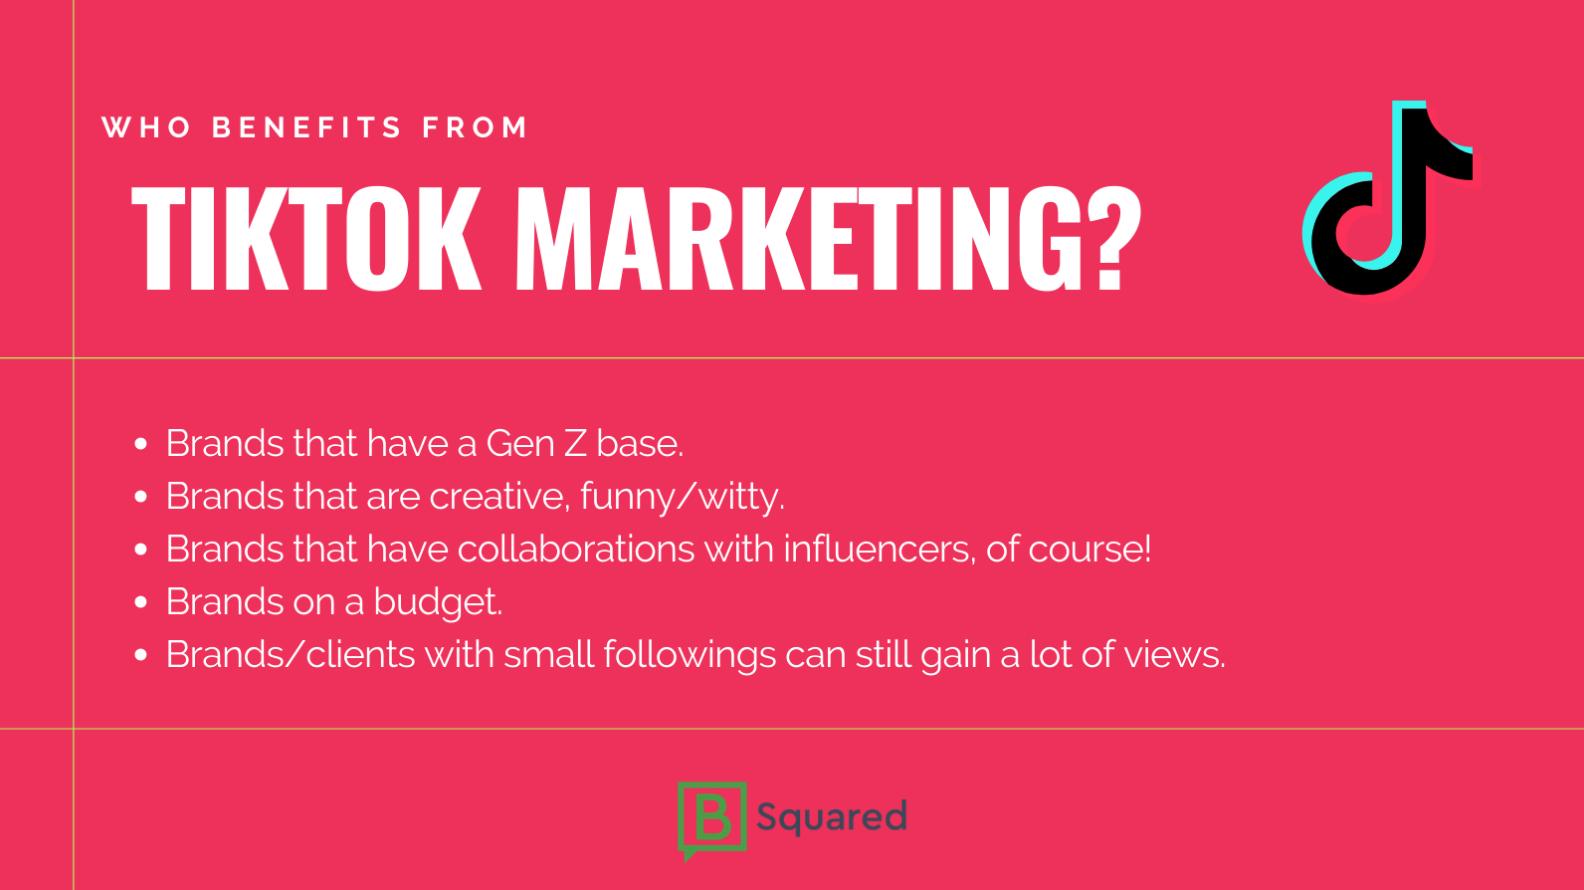 Tiktok Marketing In 2021 Infographic Marketing Marketing Social Media Marketing